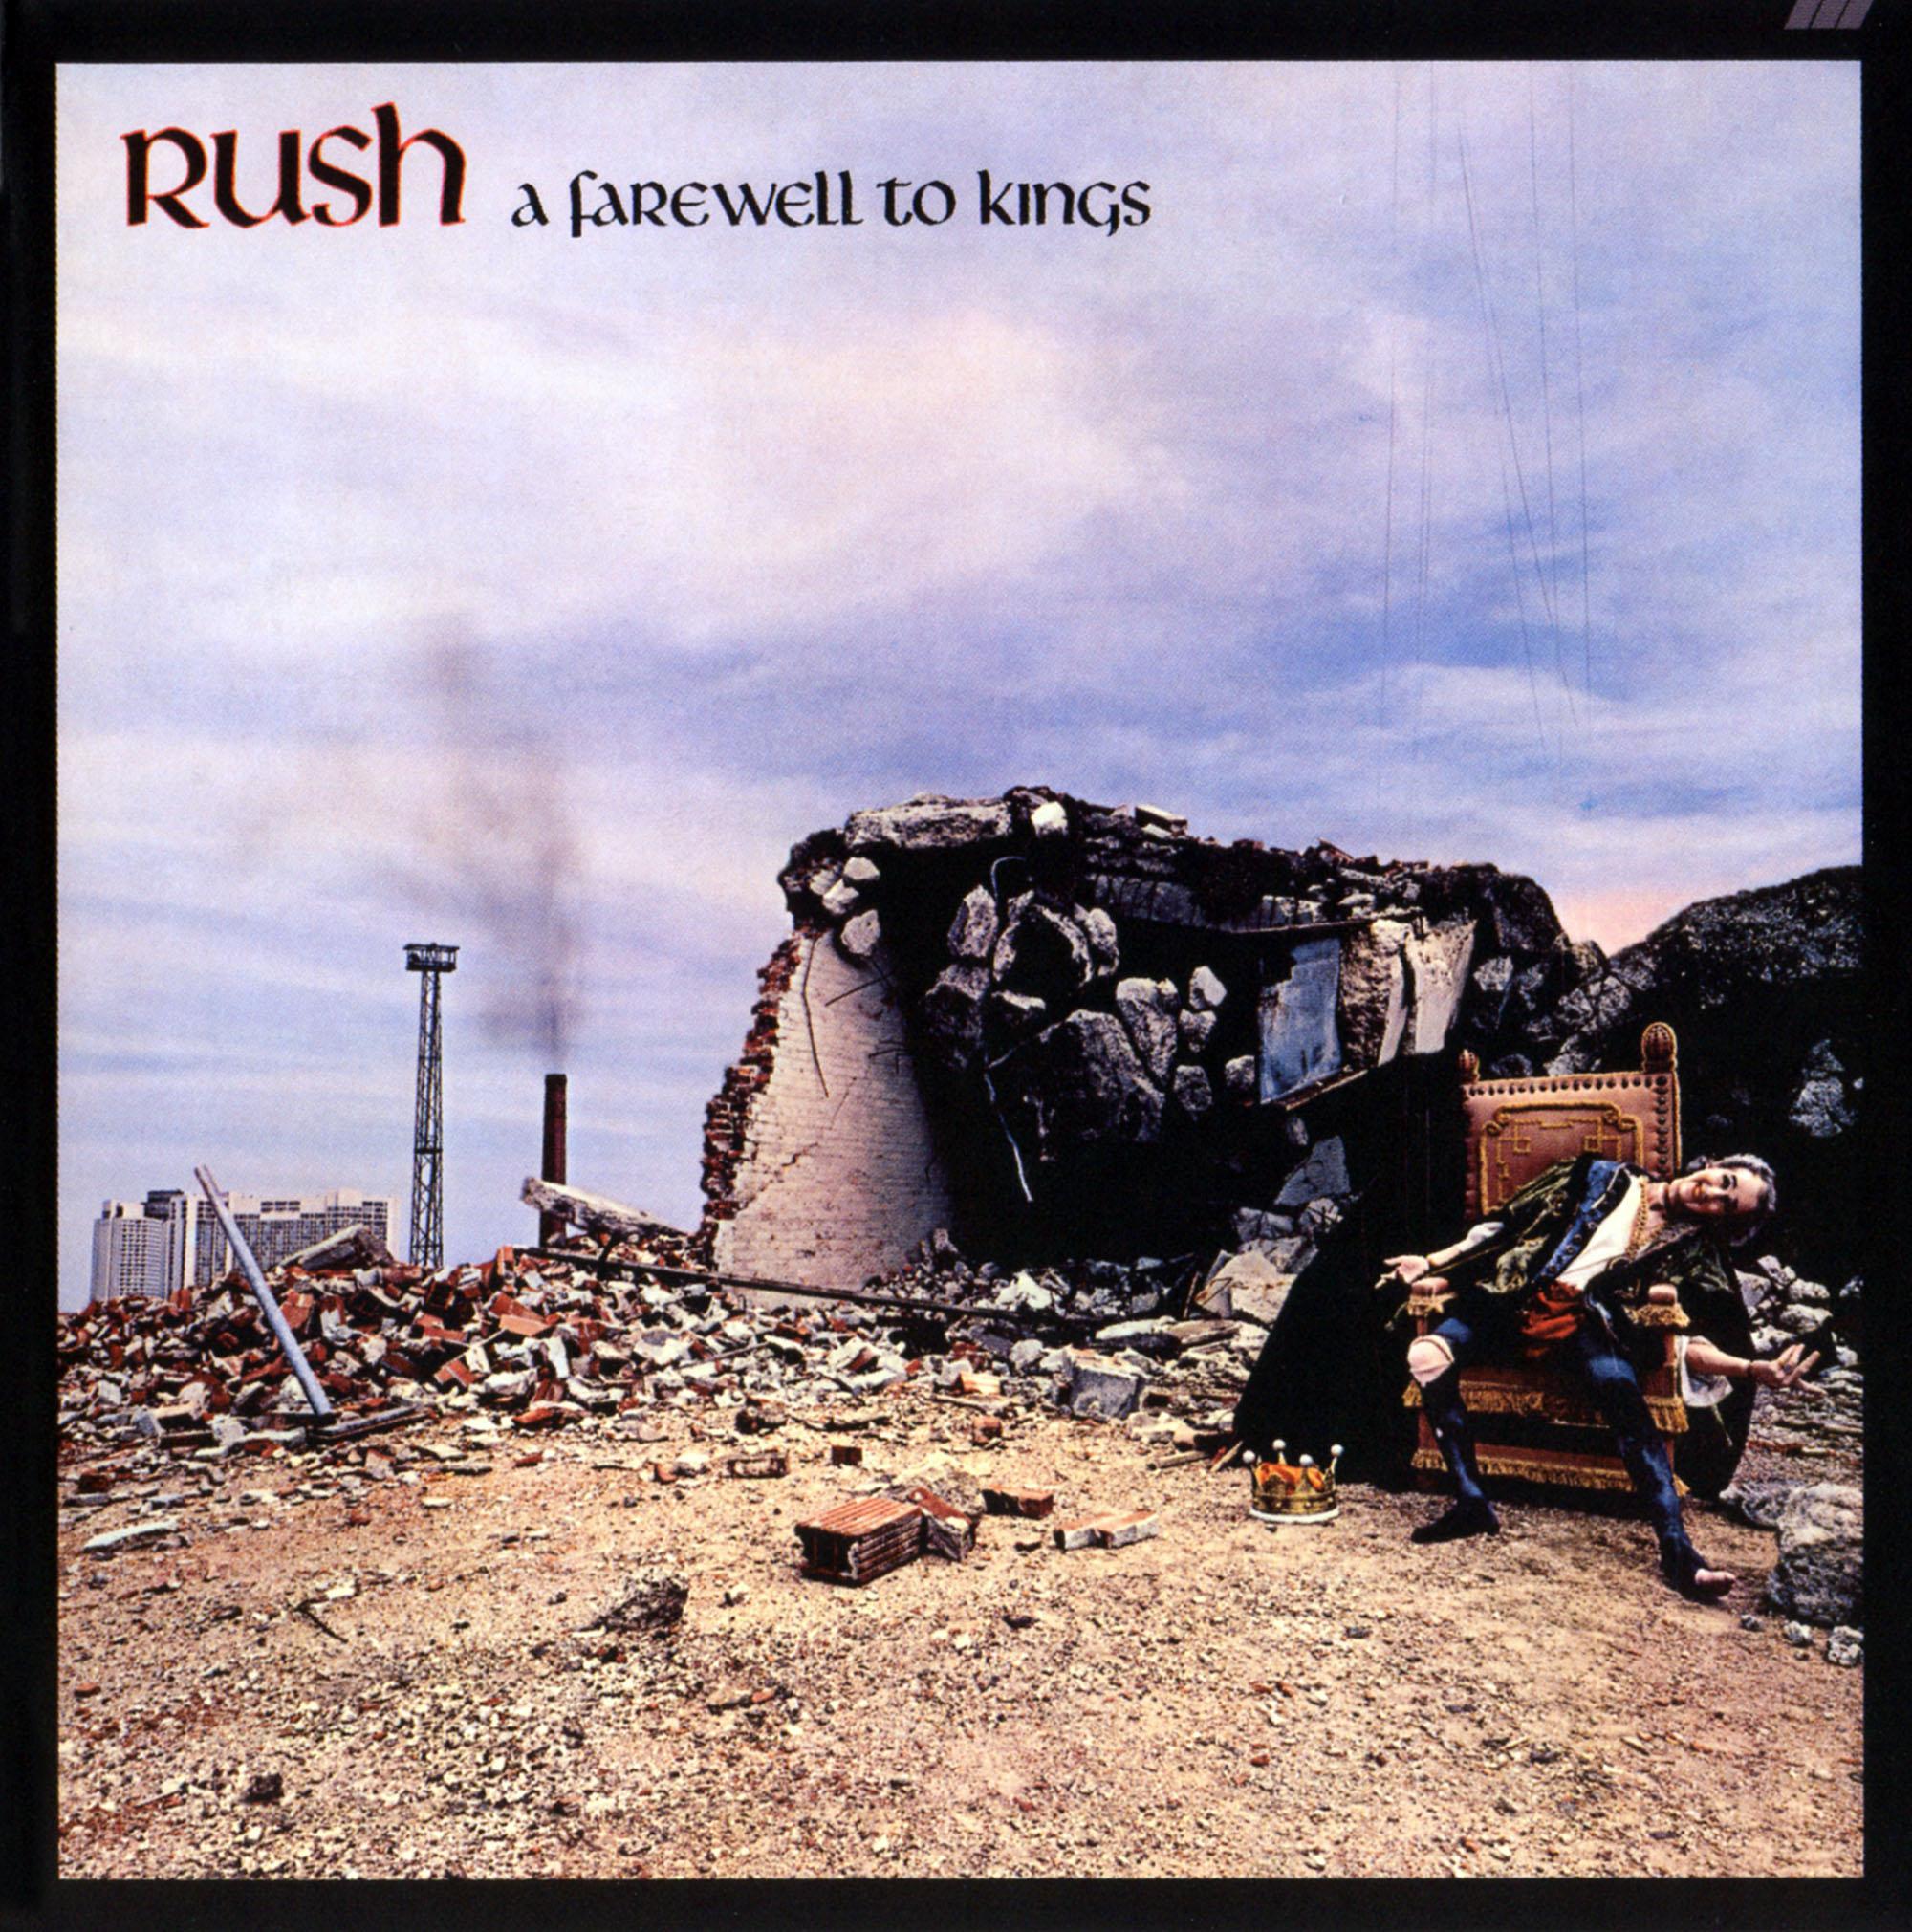 Rush a farewell to kings album artwork - Rush album covers ...